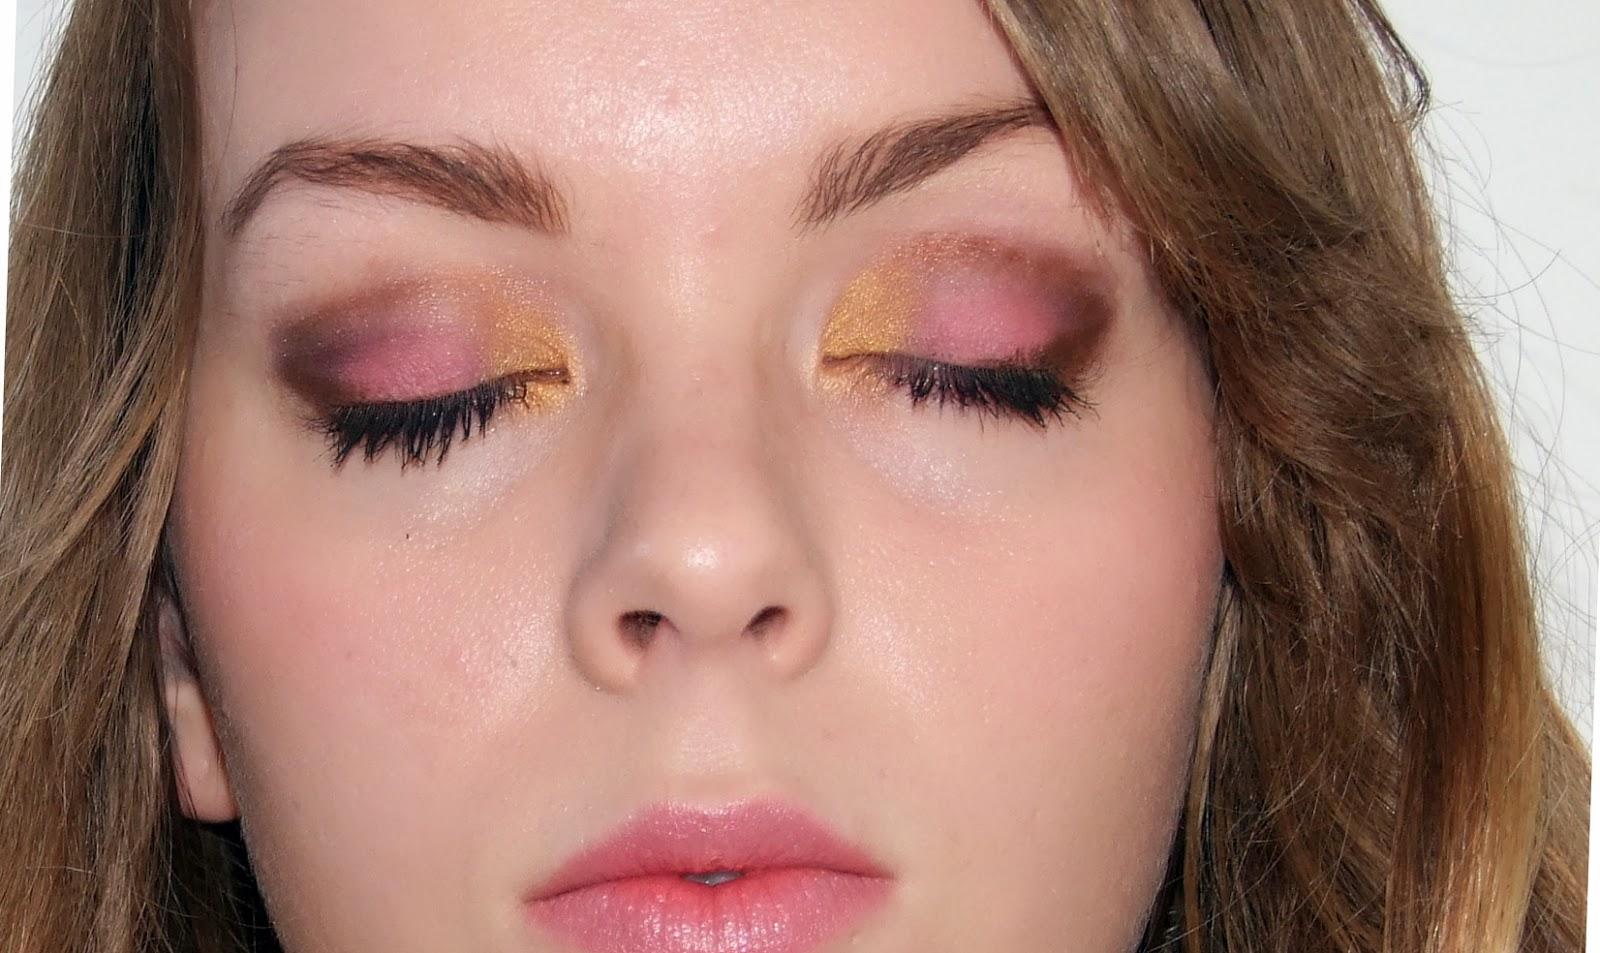 Brown and pink eye makeup